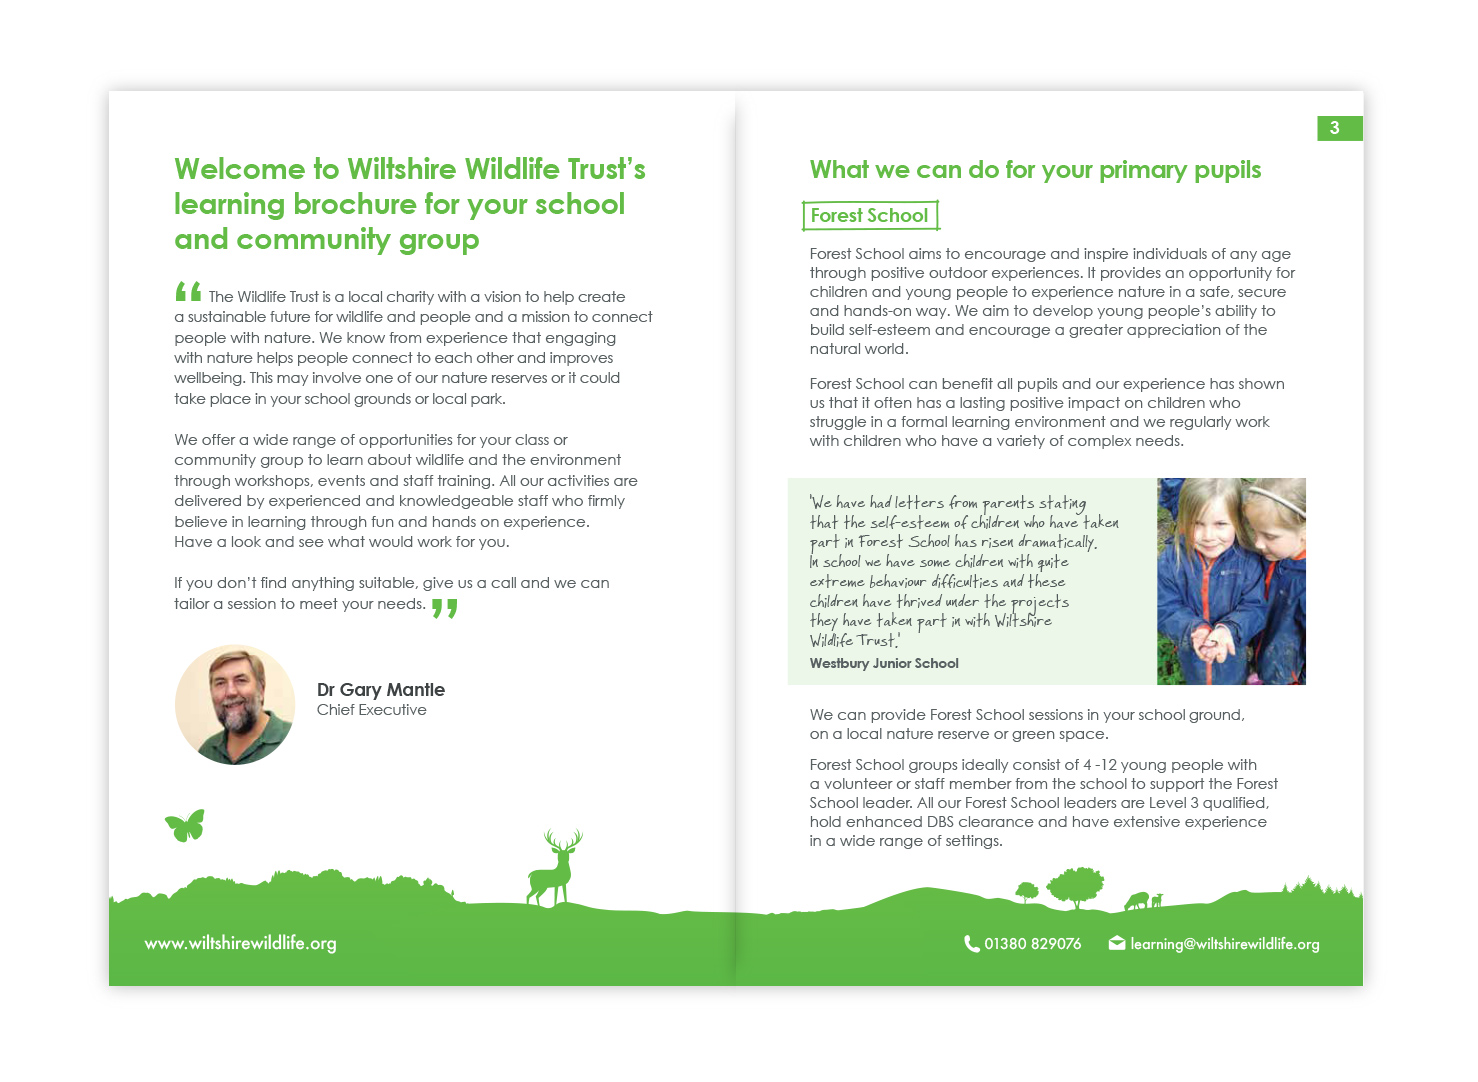 Brochure design for Wiltshire Wildlife Trust - The Brand